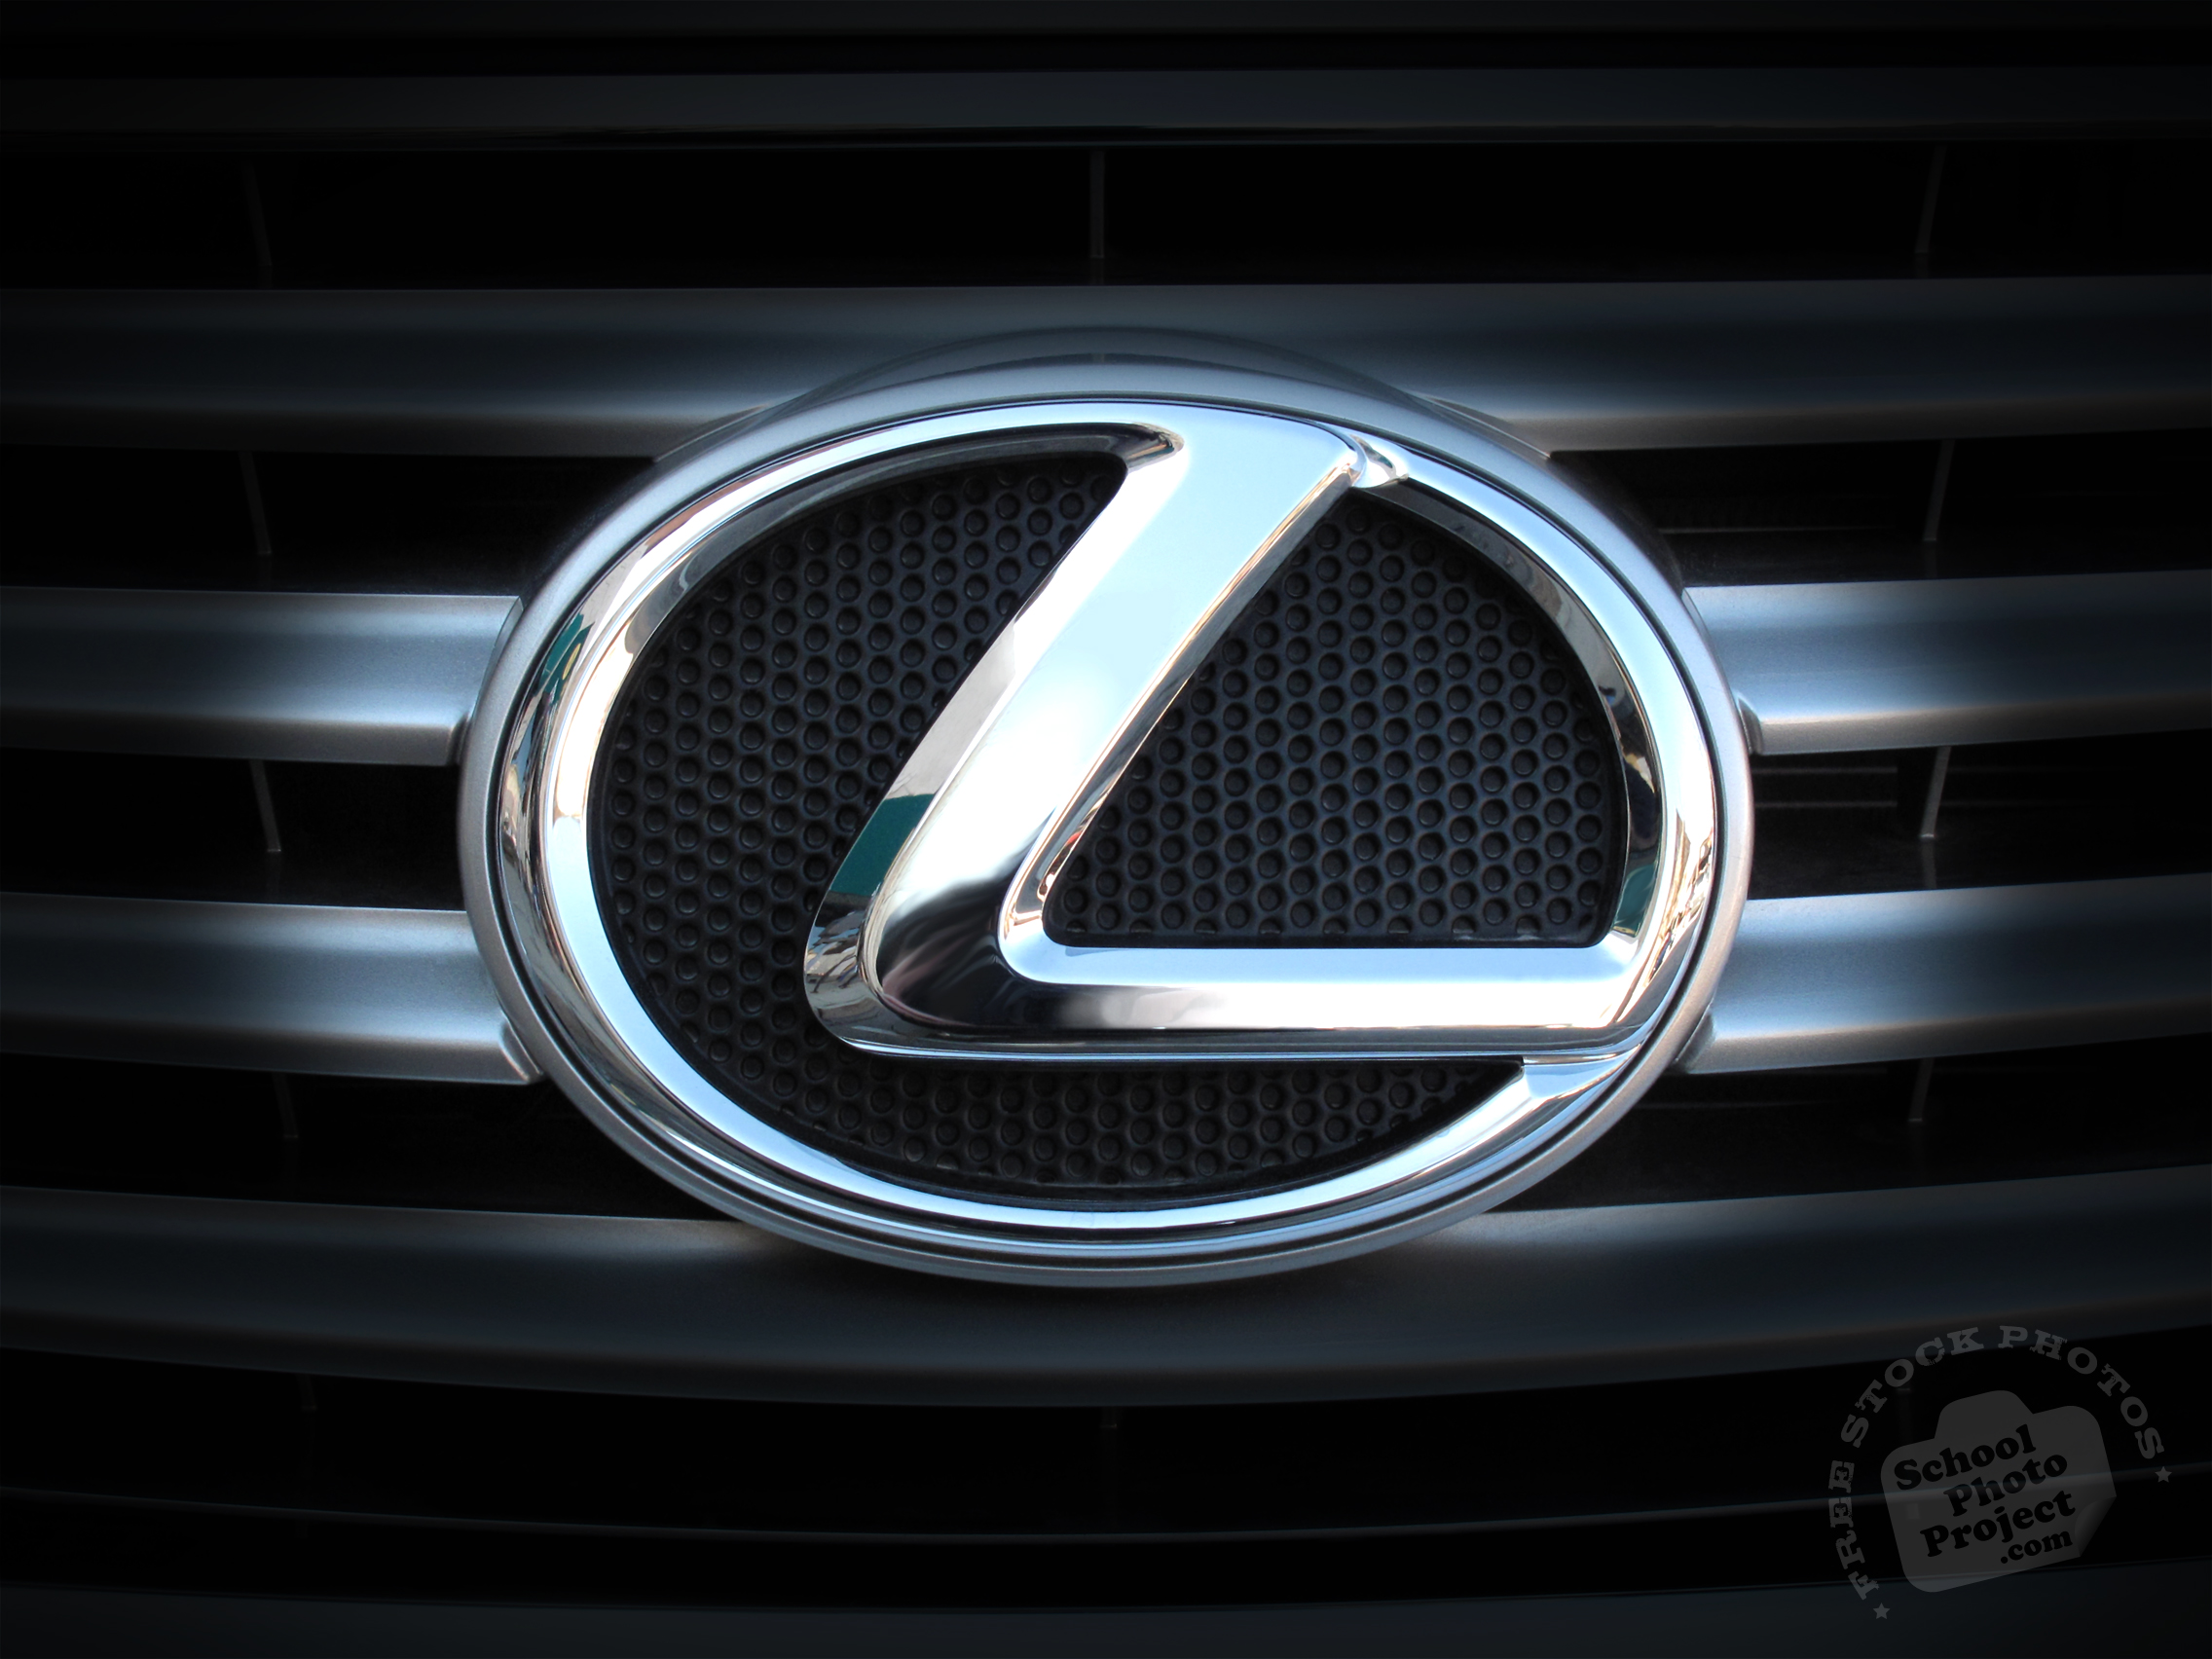 Lexus Logo Brand Car Luxury Auto Automobile